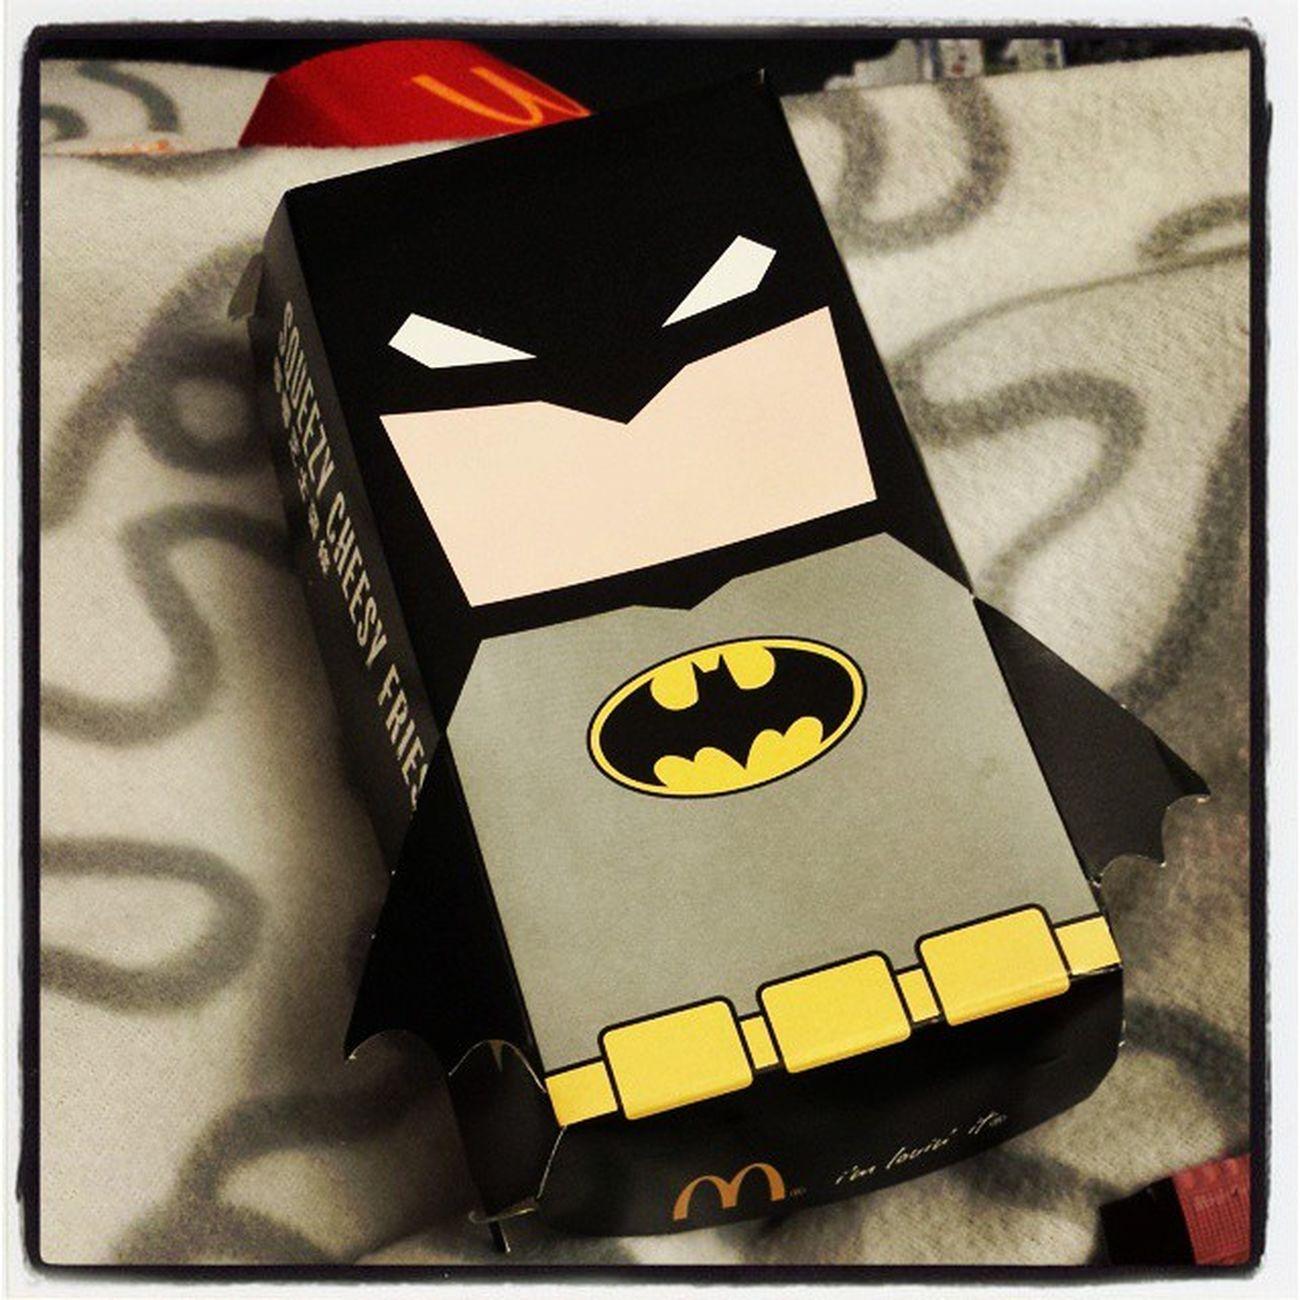 Mcdonalds Batmanmcdonalds Superhero Ithasacape HongKong Fastfood